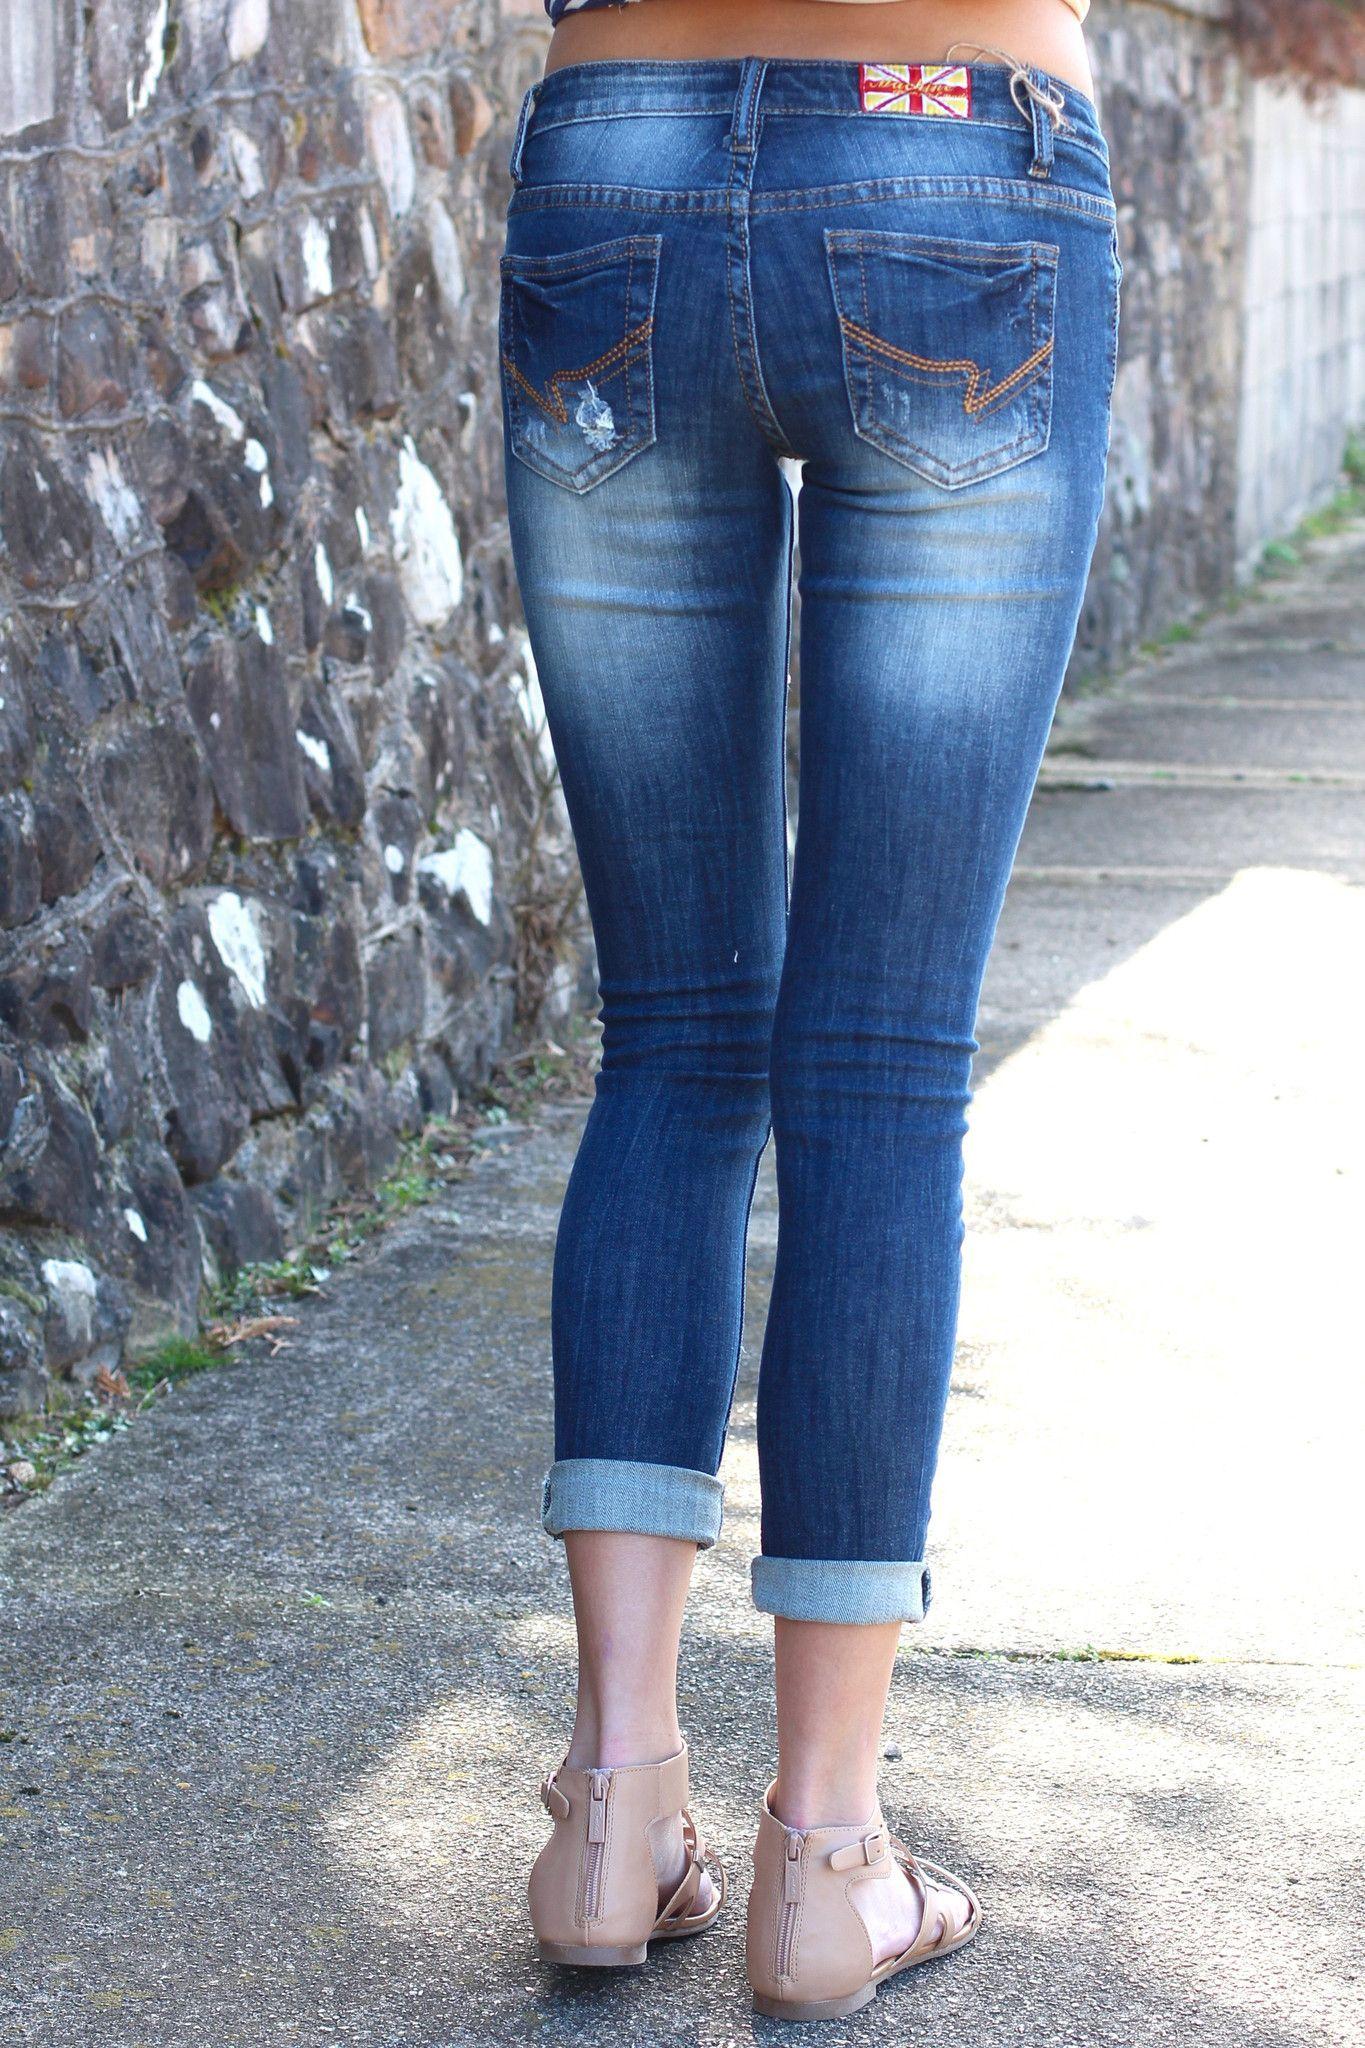 Distressed out capri jeans medium wash denim the